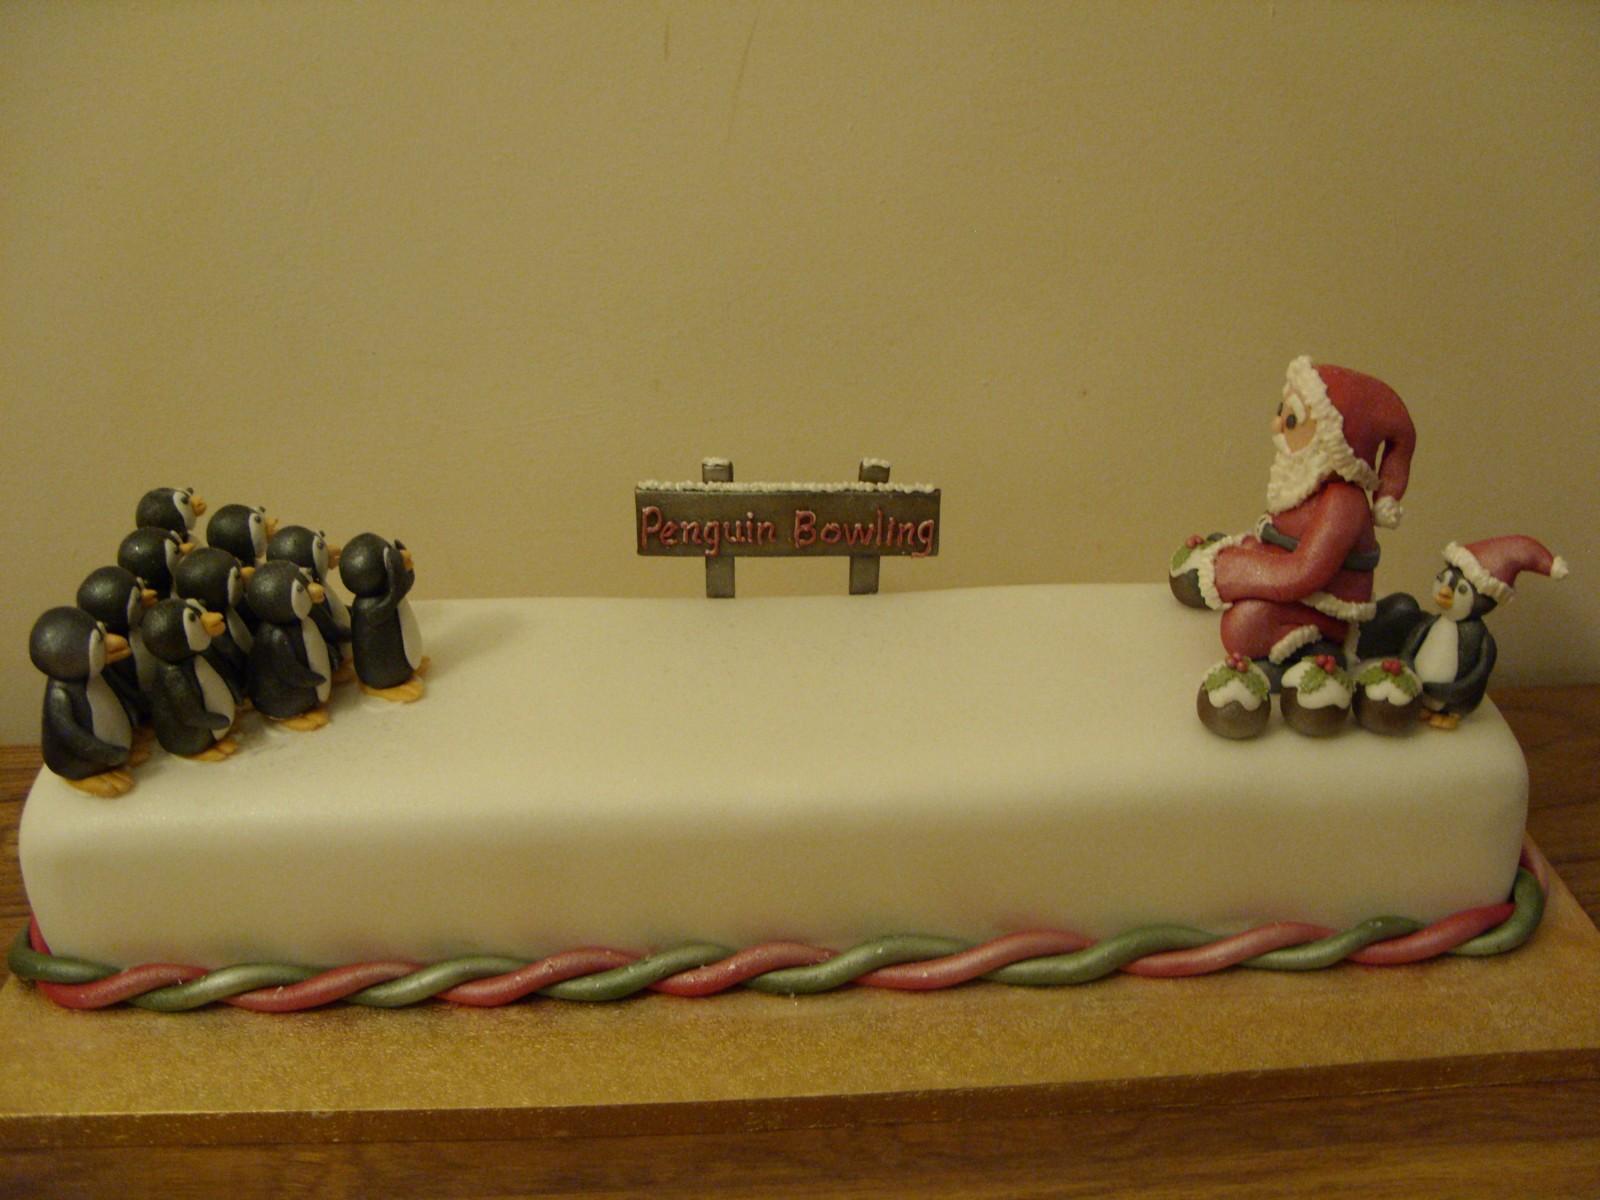 Christmas Cake Designs Novelty : Santa Bowling Novelty Christmas Cake   Susie s Cakes